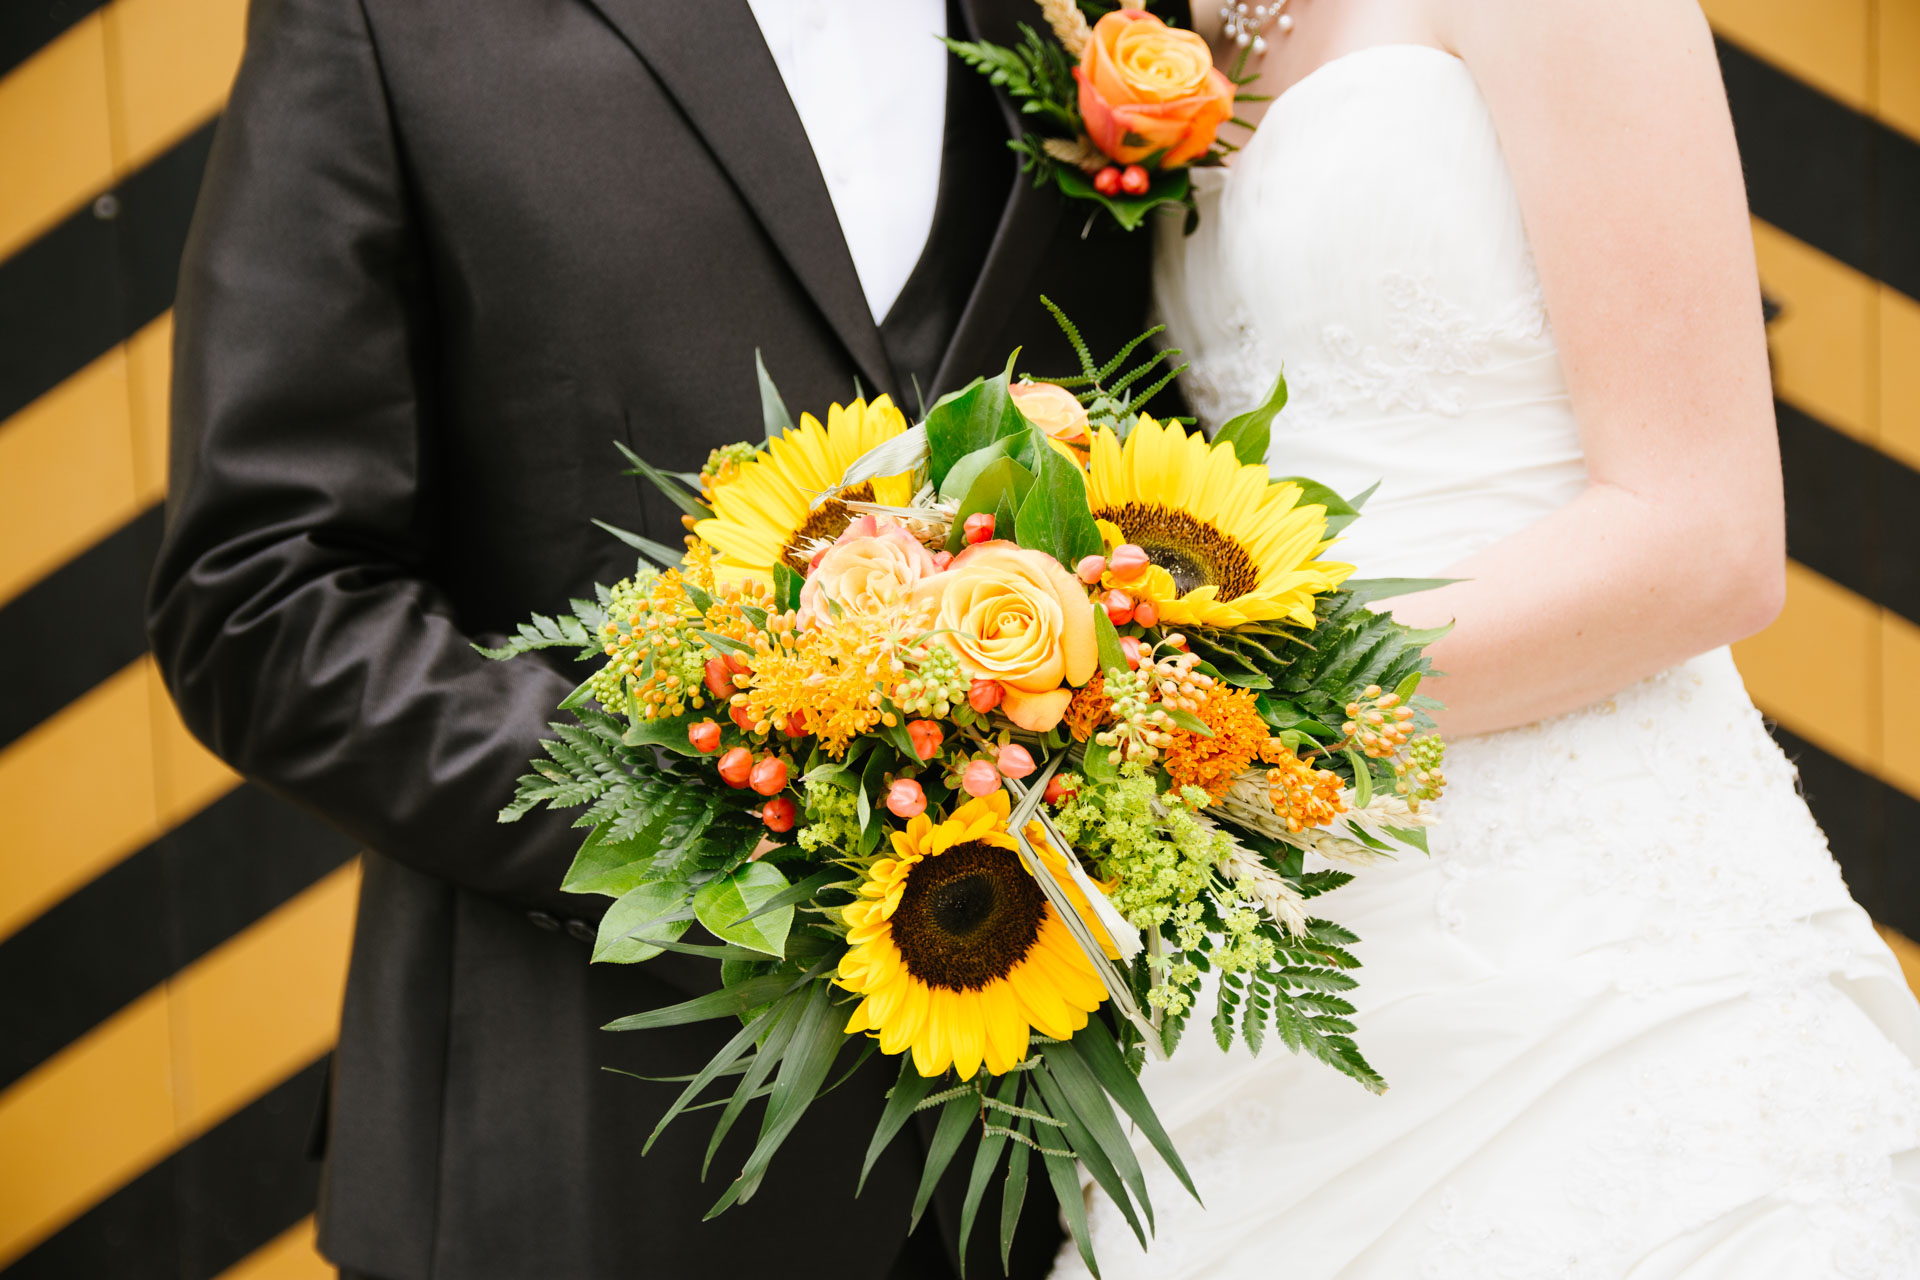 Pixelart_Hochzeitsfotografen_Loerrach_Rheinfelden_Hallwil_Schweiz_Linda-Ramon-1002